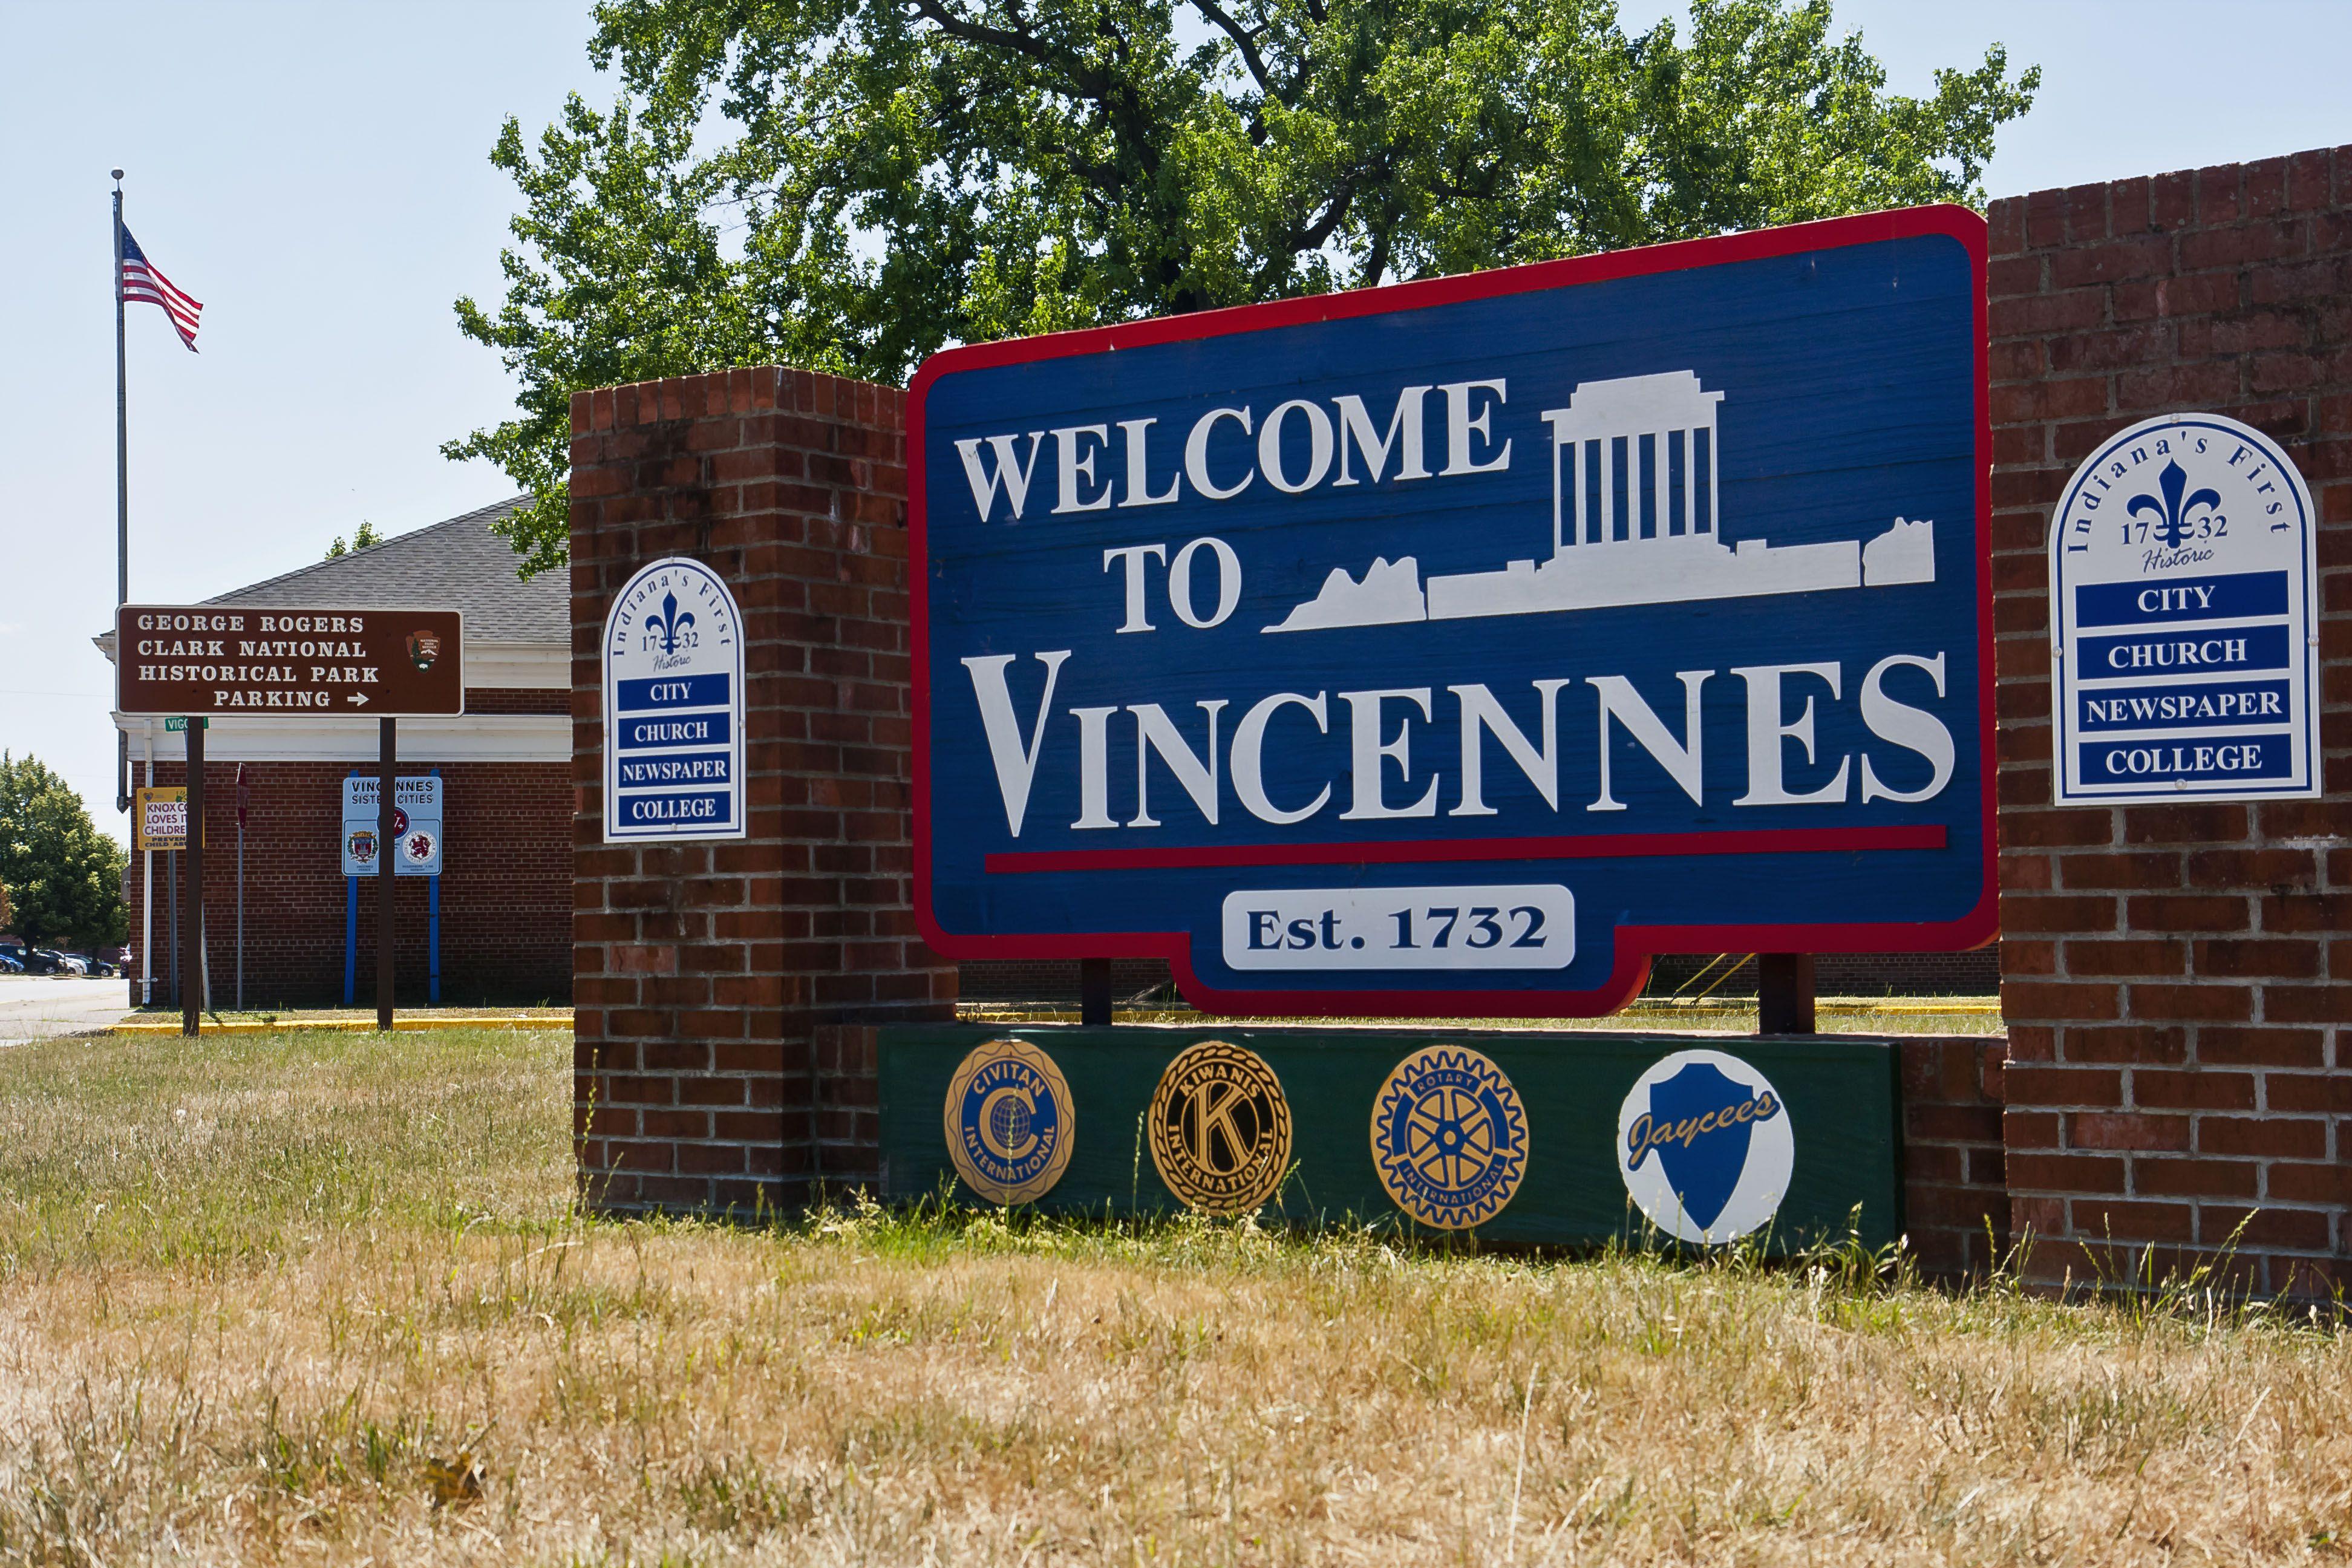 finder Adult vincennes couple friend